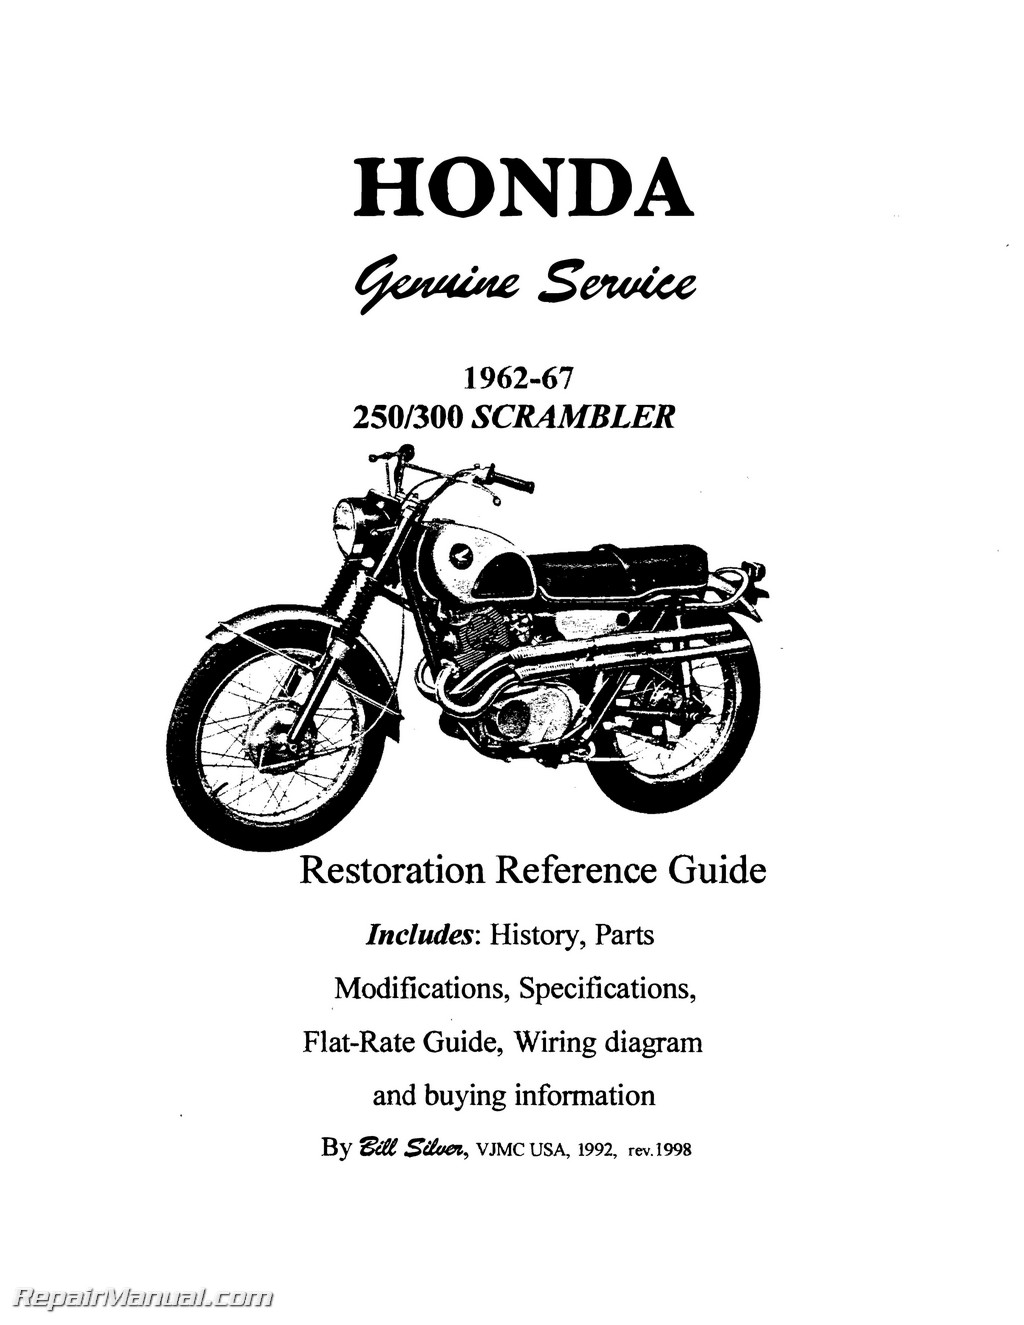 Honda Superhawk Amp Scrambler Motorcycle Restoration Reference Guide